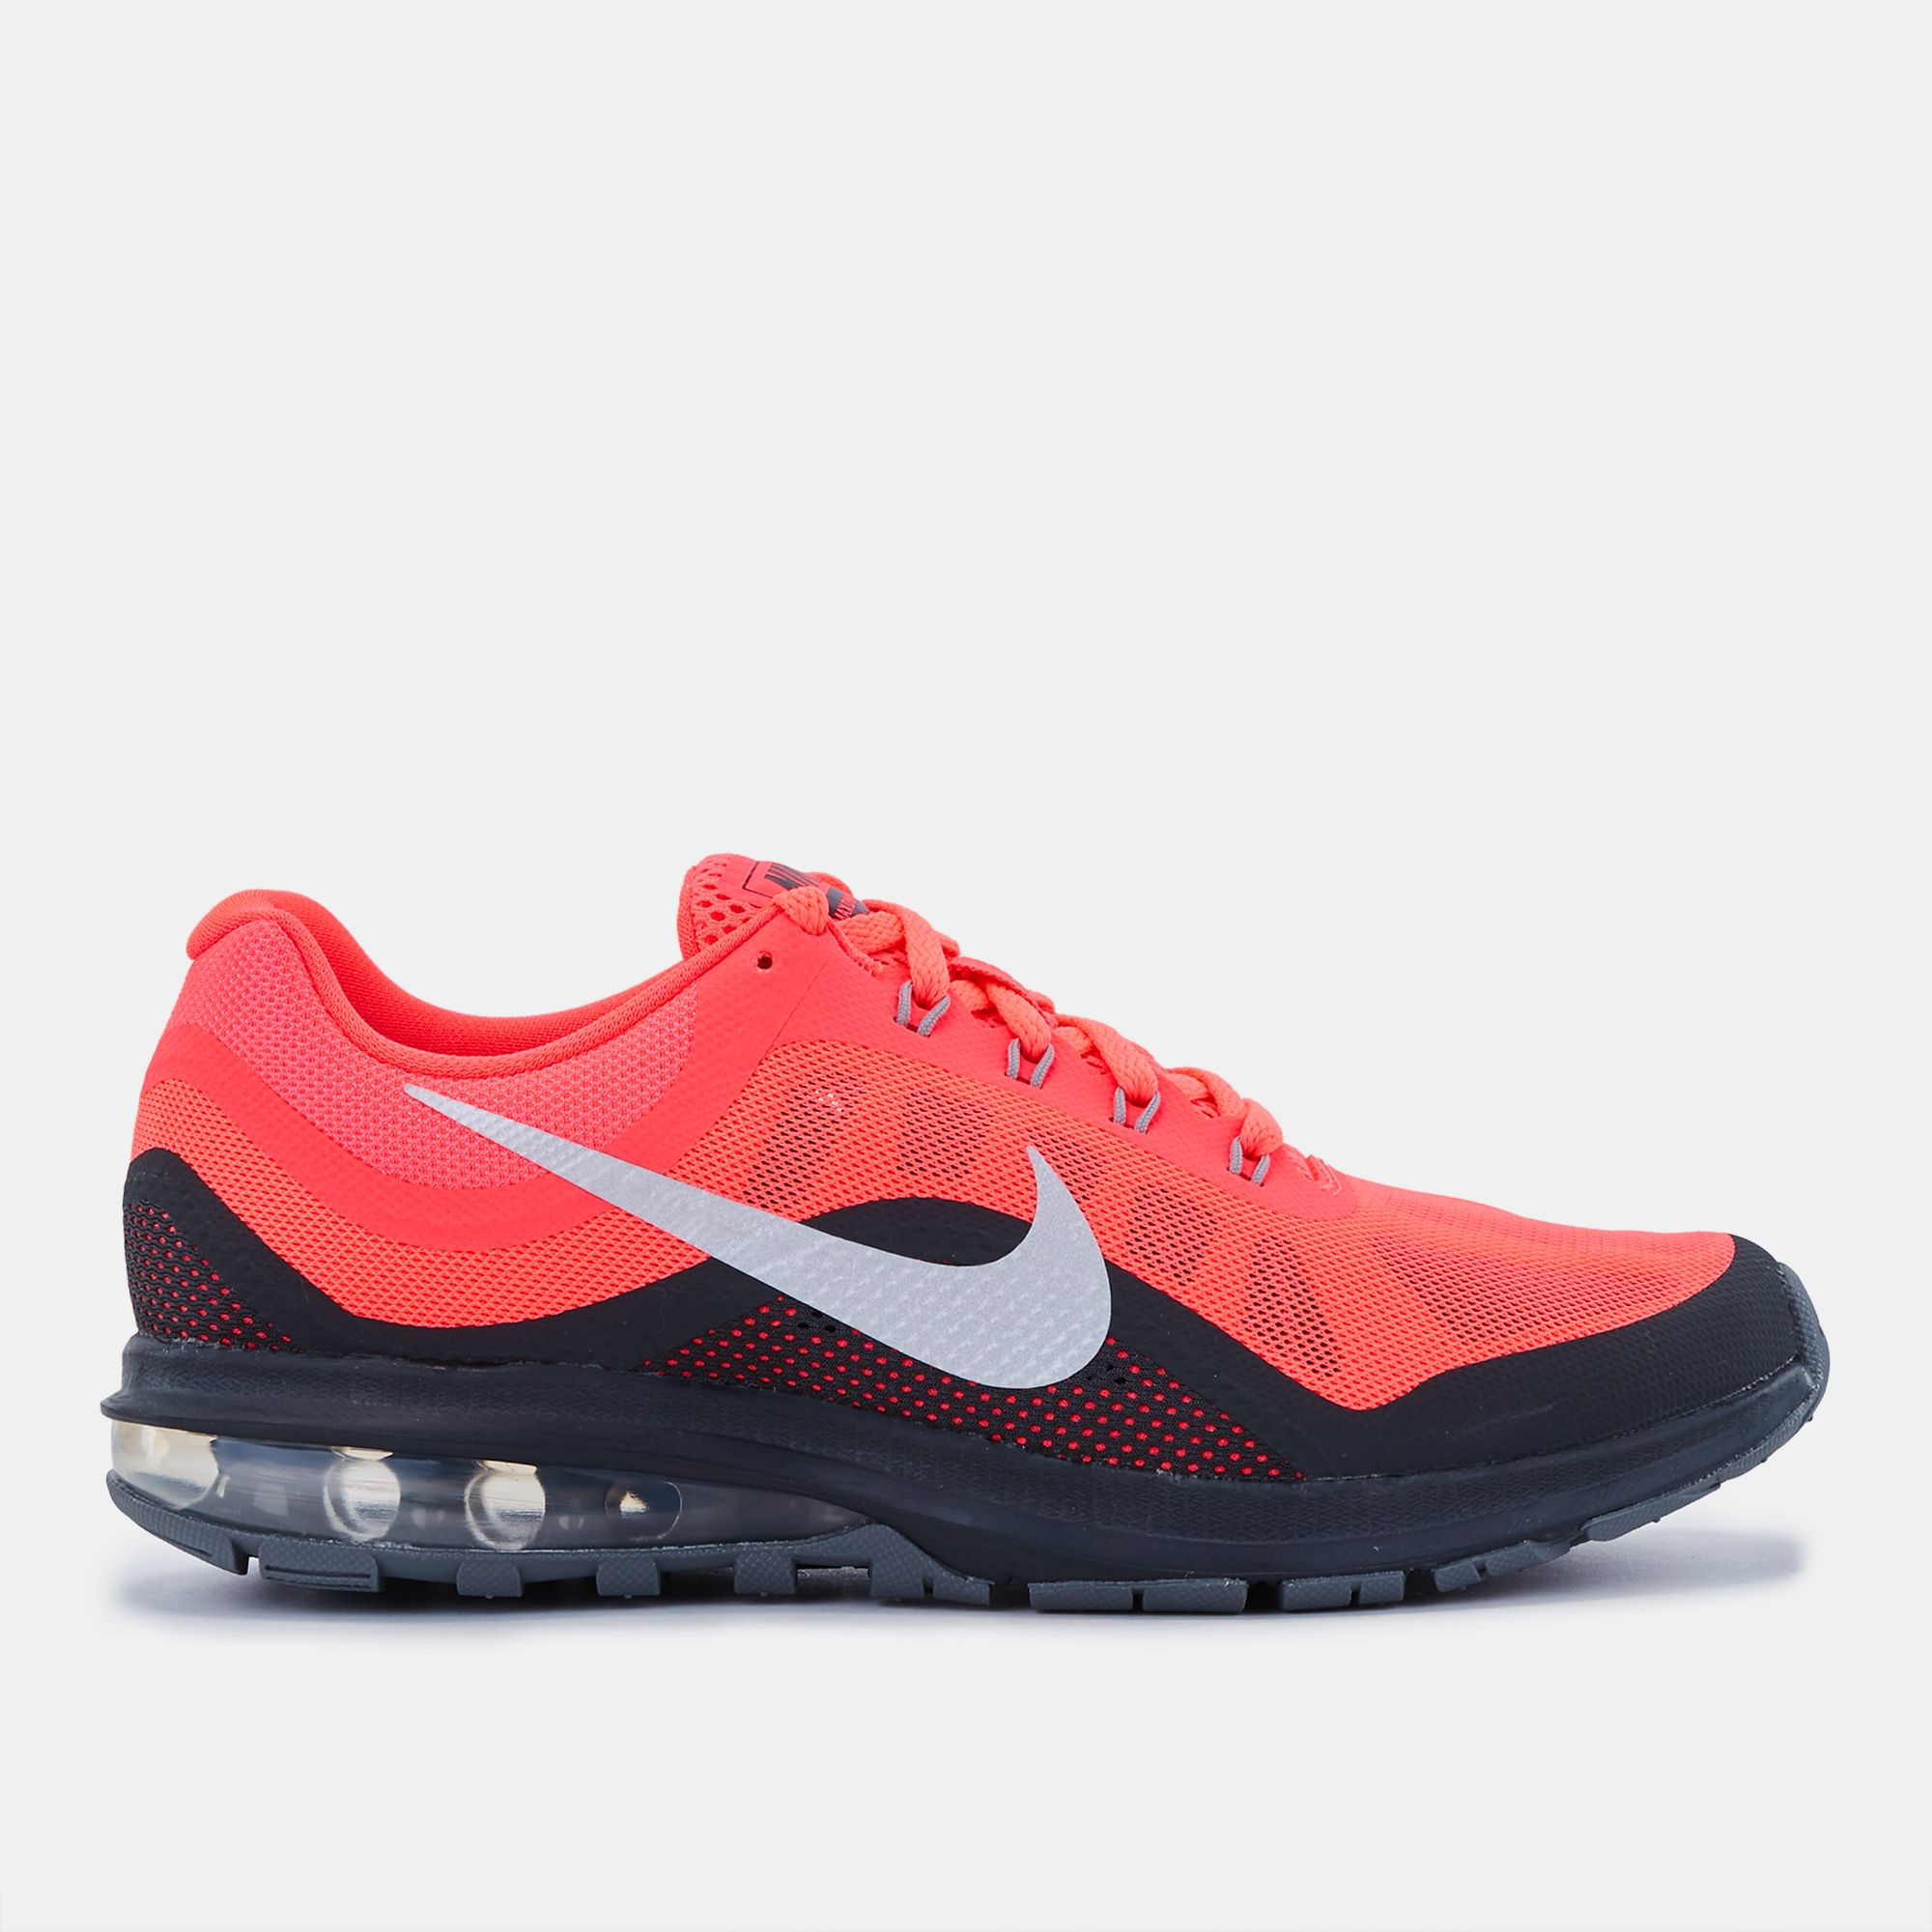 918c925e5c ... canada nike air max dynasty 2 shoe d27dd c3d5c